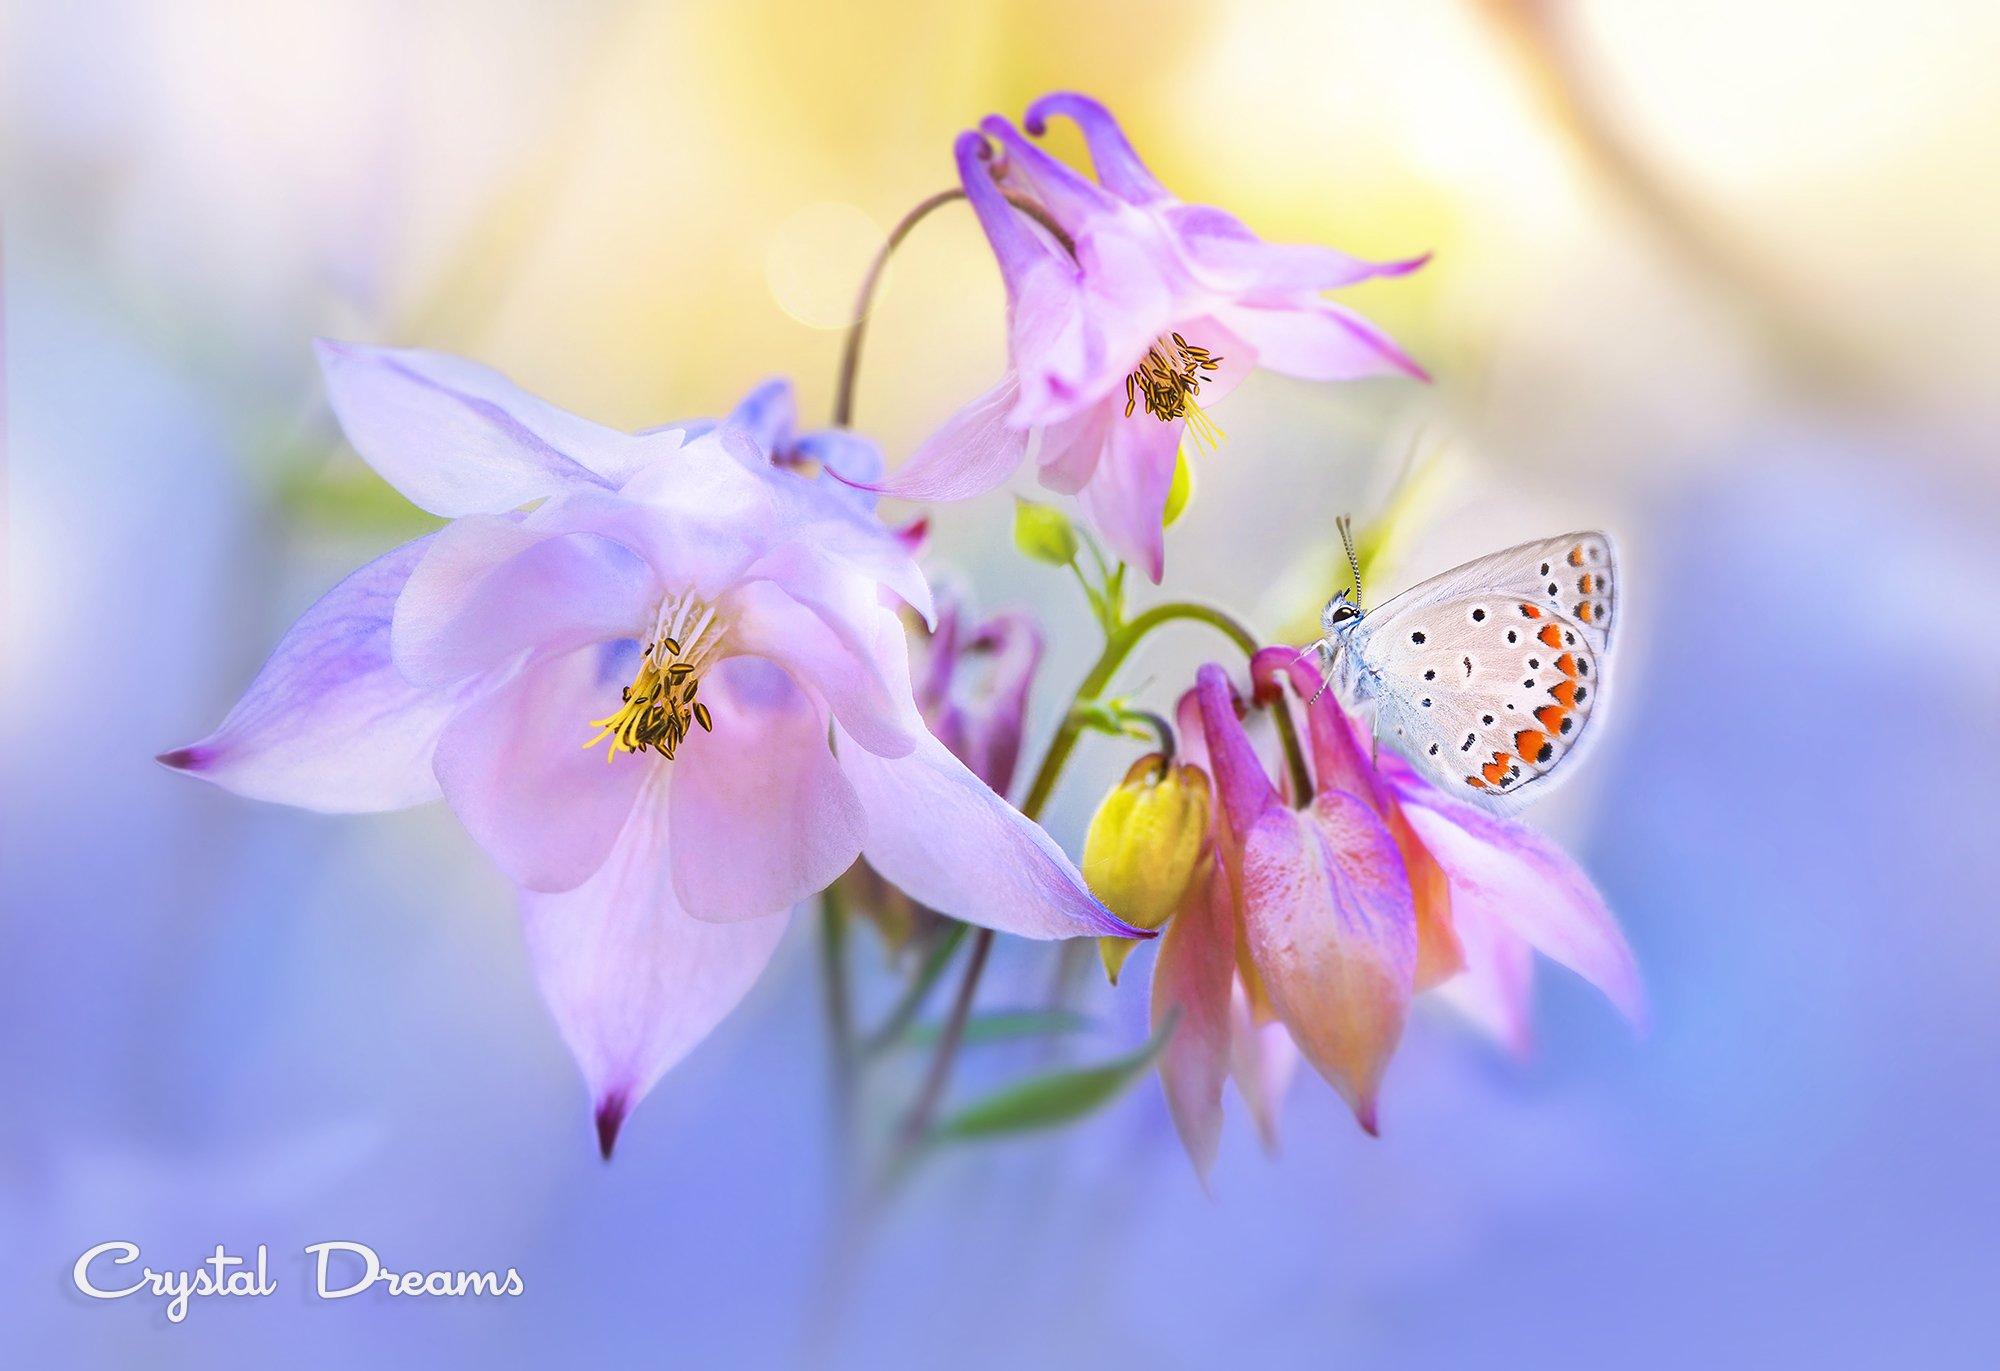 Art, Butterfly, Crystal Deams, Day, In color, Light, Macro, Nature, Tatiana Krylova, Крылова Татьяна